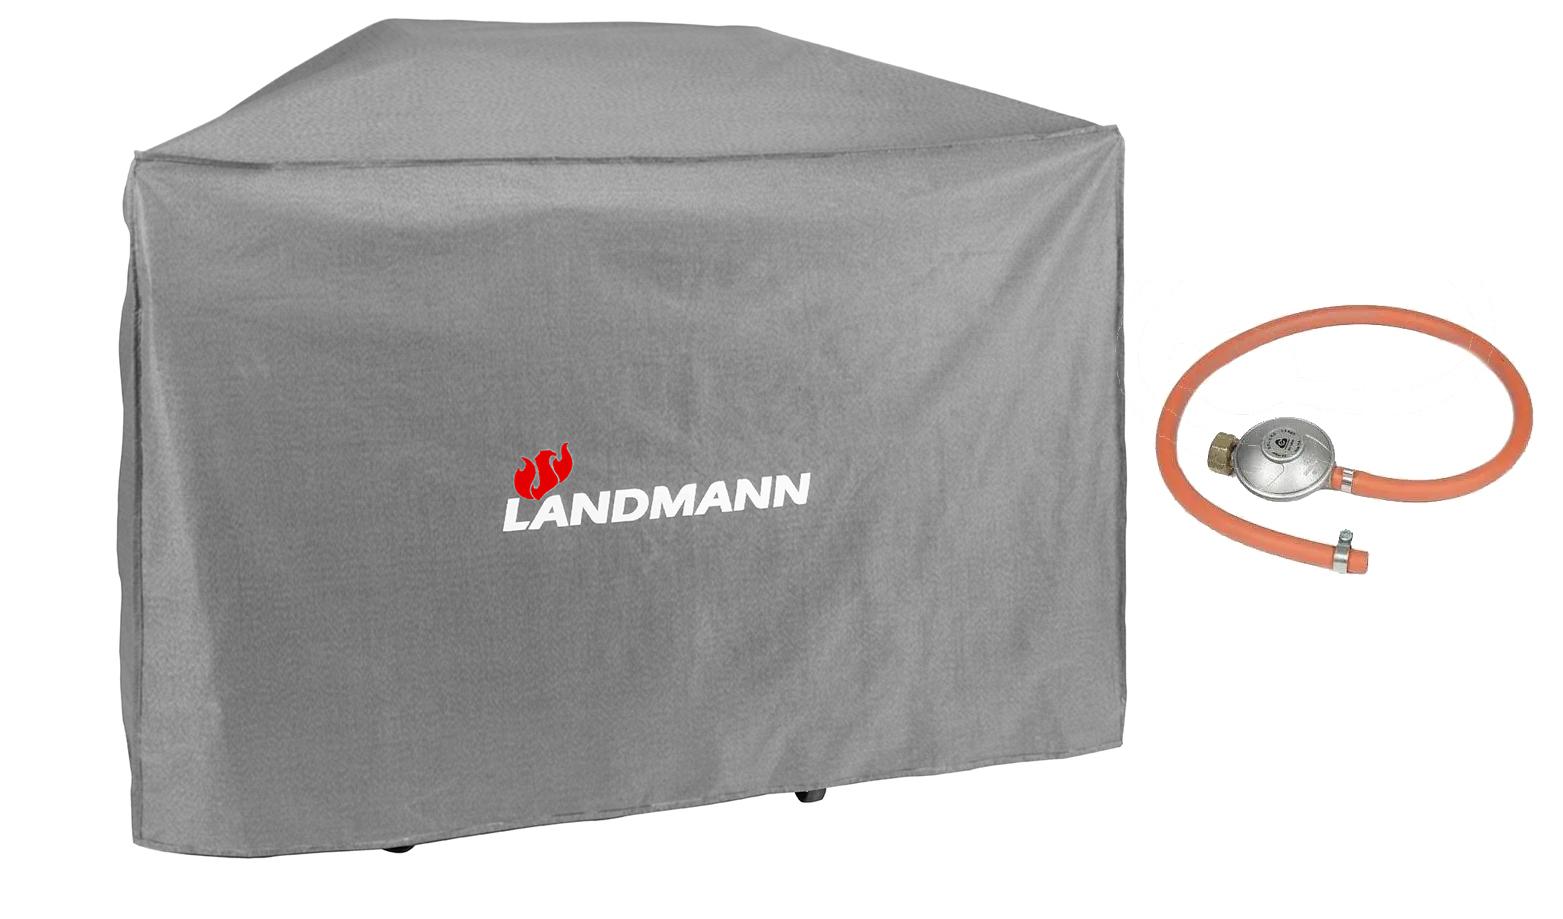 Landmann Premium ochranný obal na gril XXL